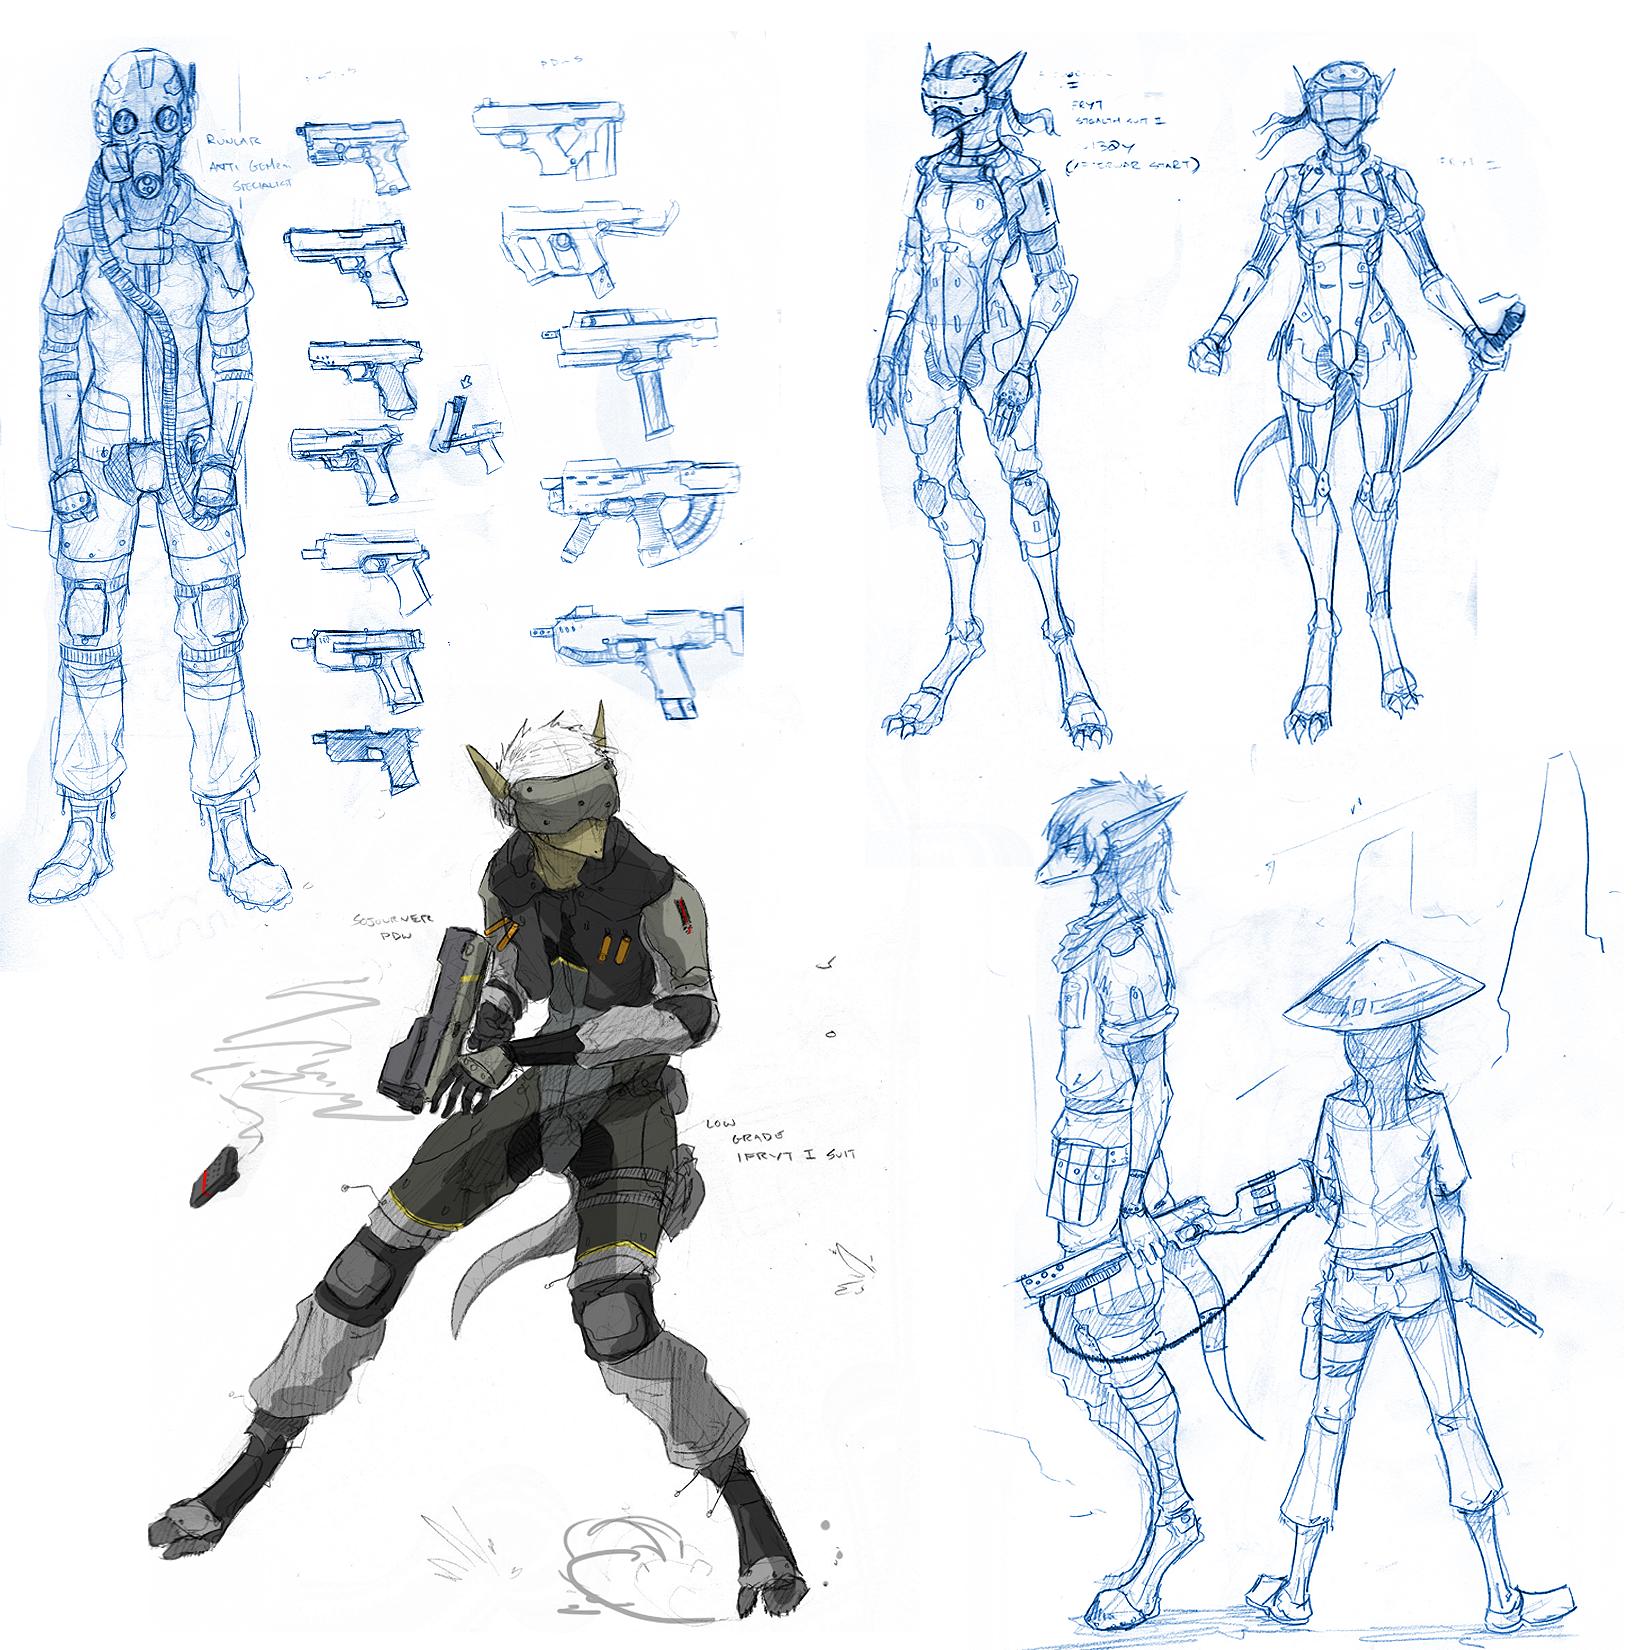 Giant Sketchdump VI / Planedump III by Zaeta-K